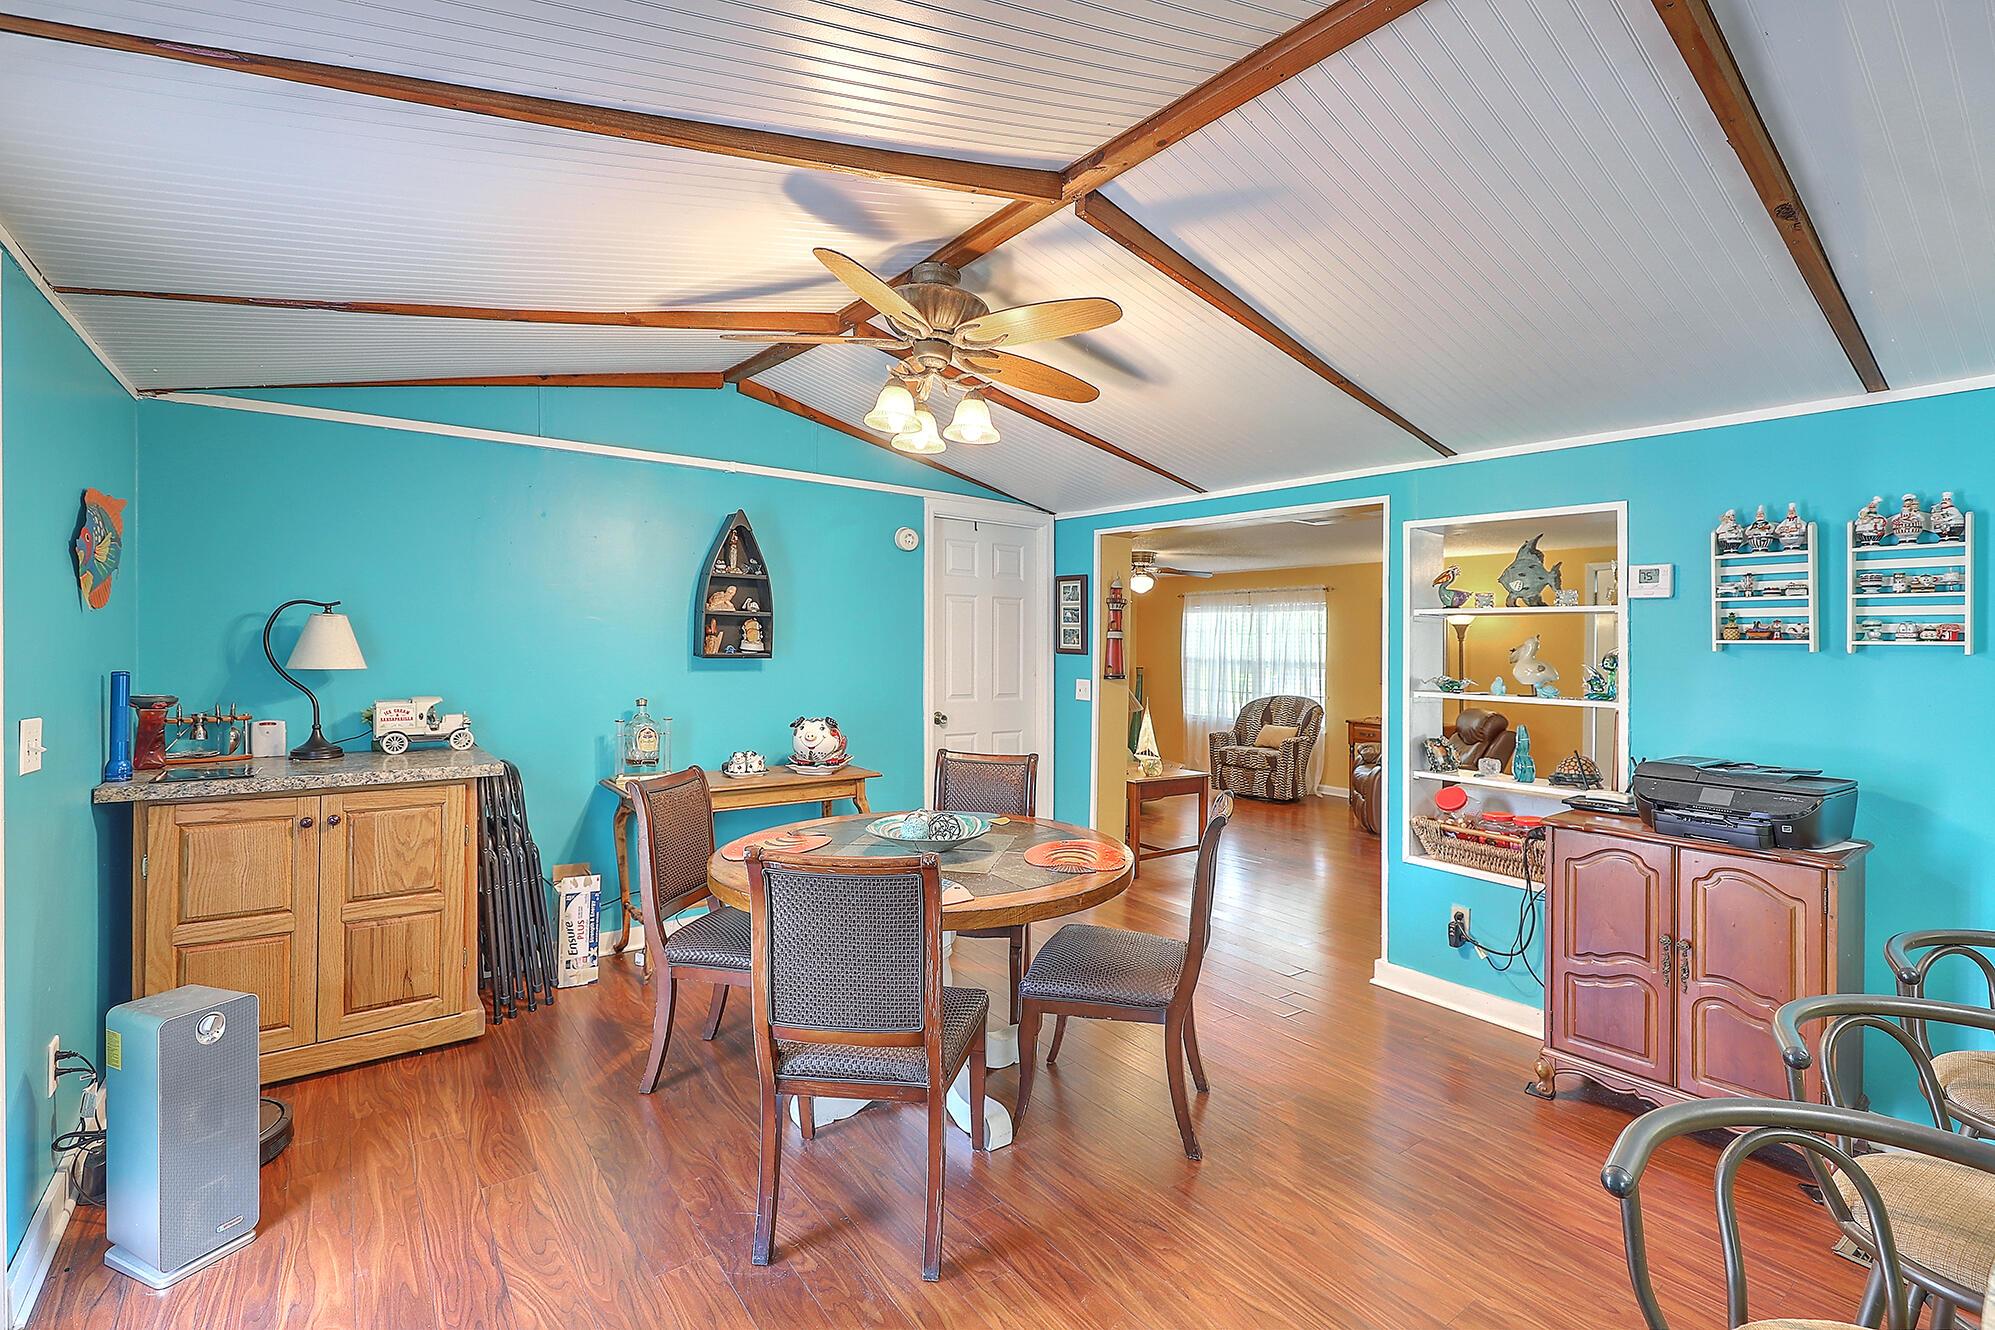 Cross Area (West) Homes For Sale - 128 Cherry Grove, Cross, SC - 37